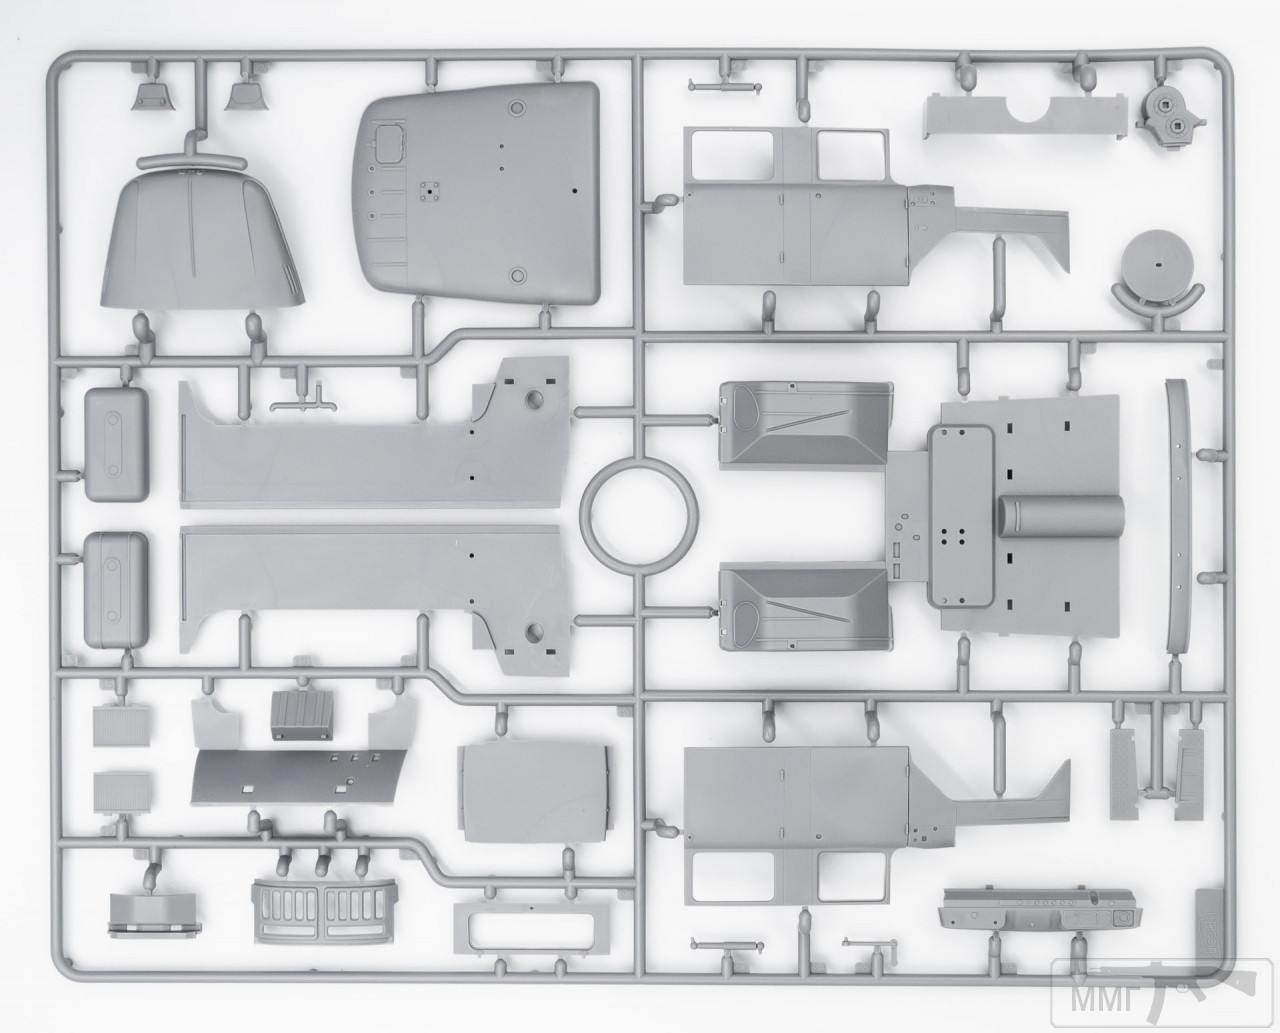 99850 - Обзор моделей и афтемаркета.